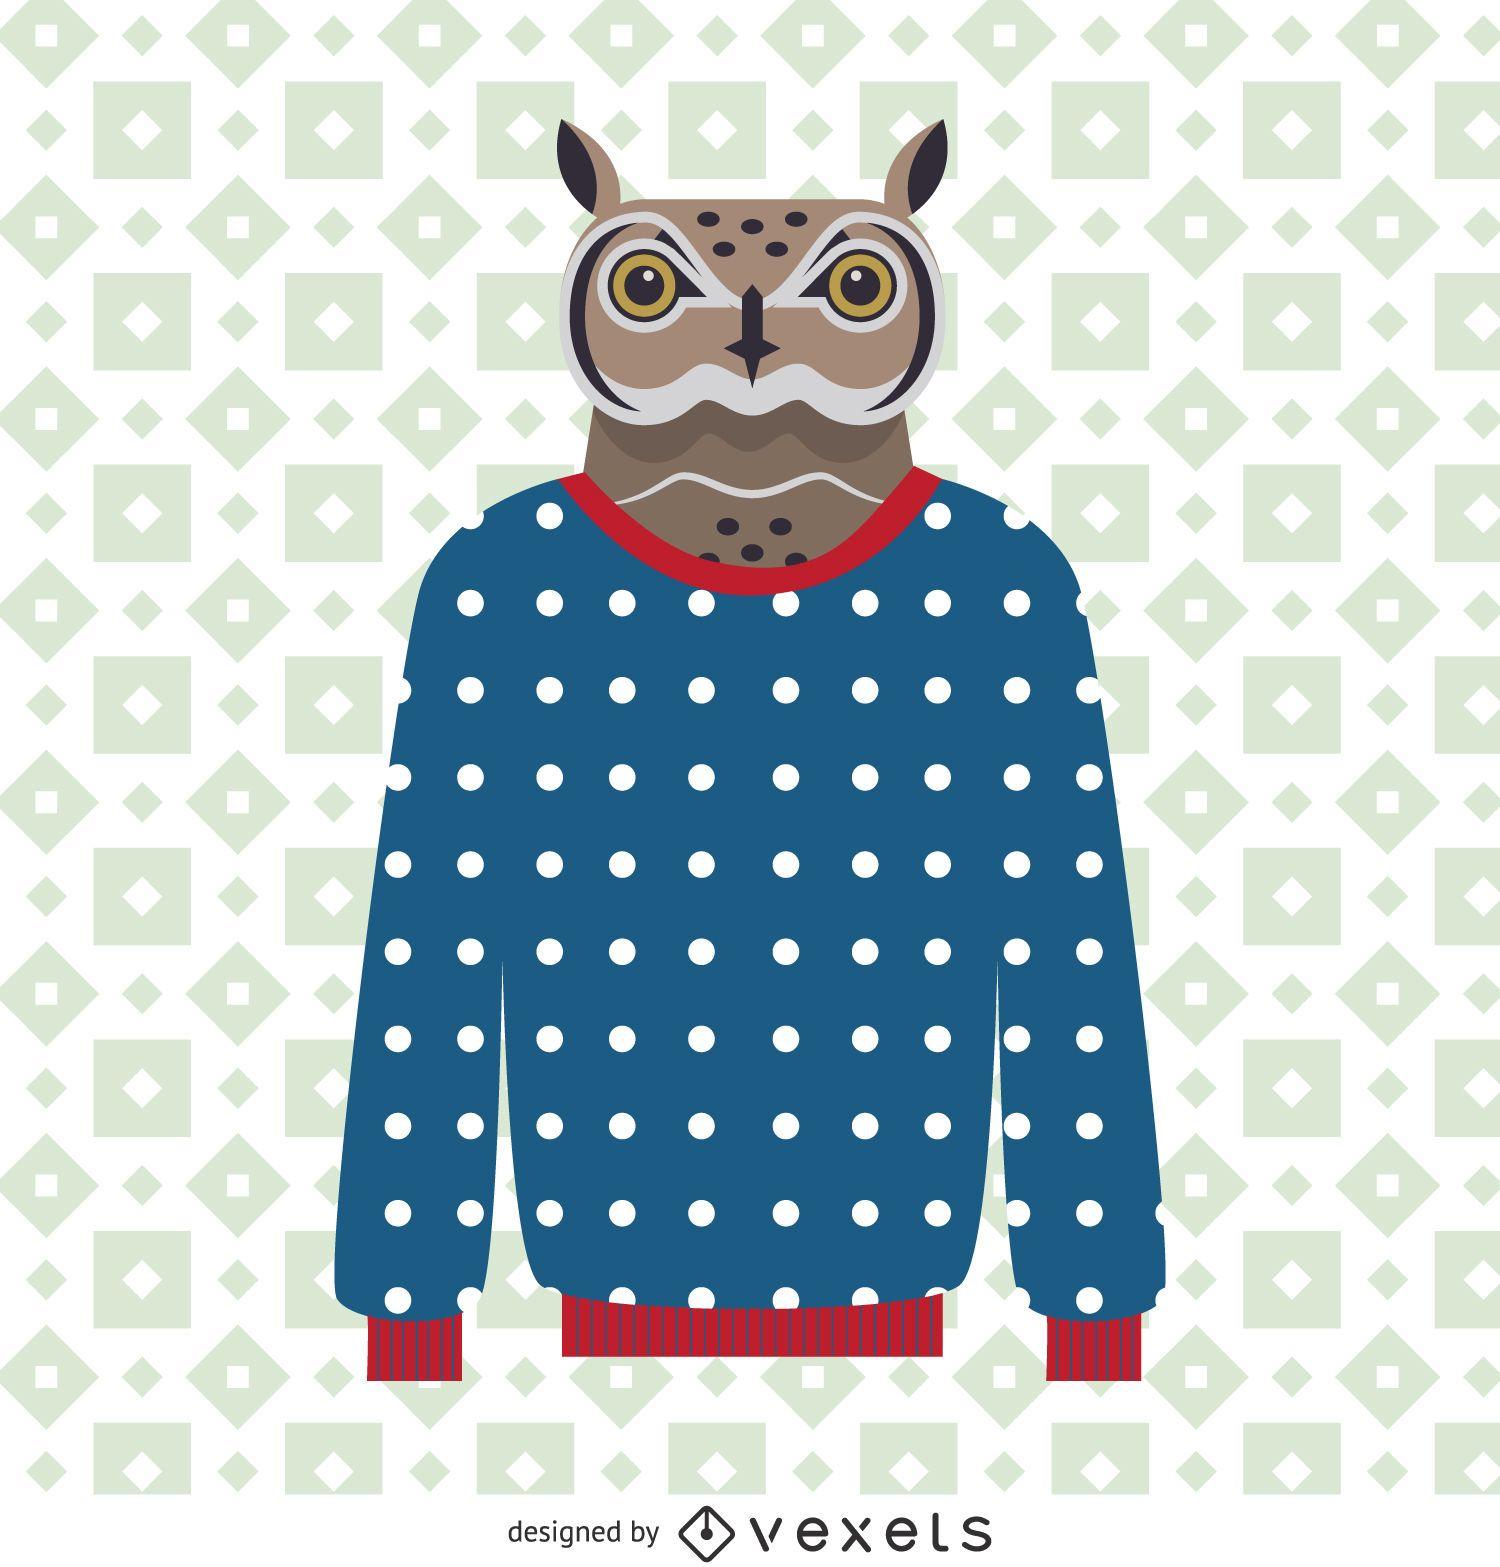 Sweater owl illustration